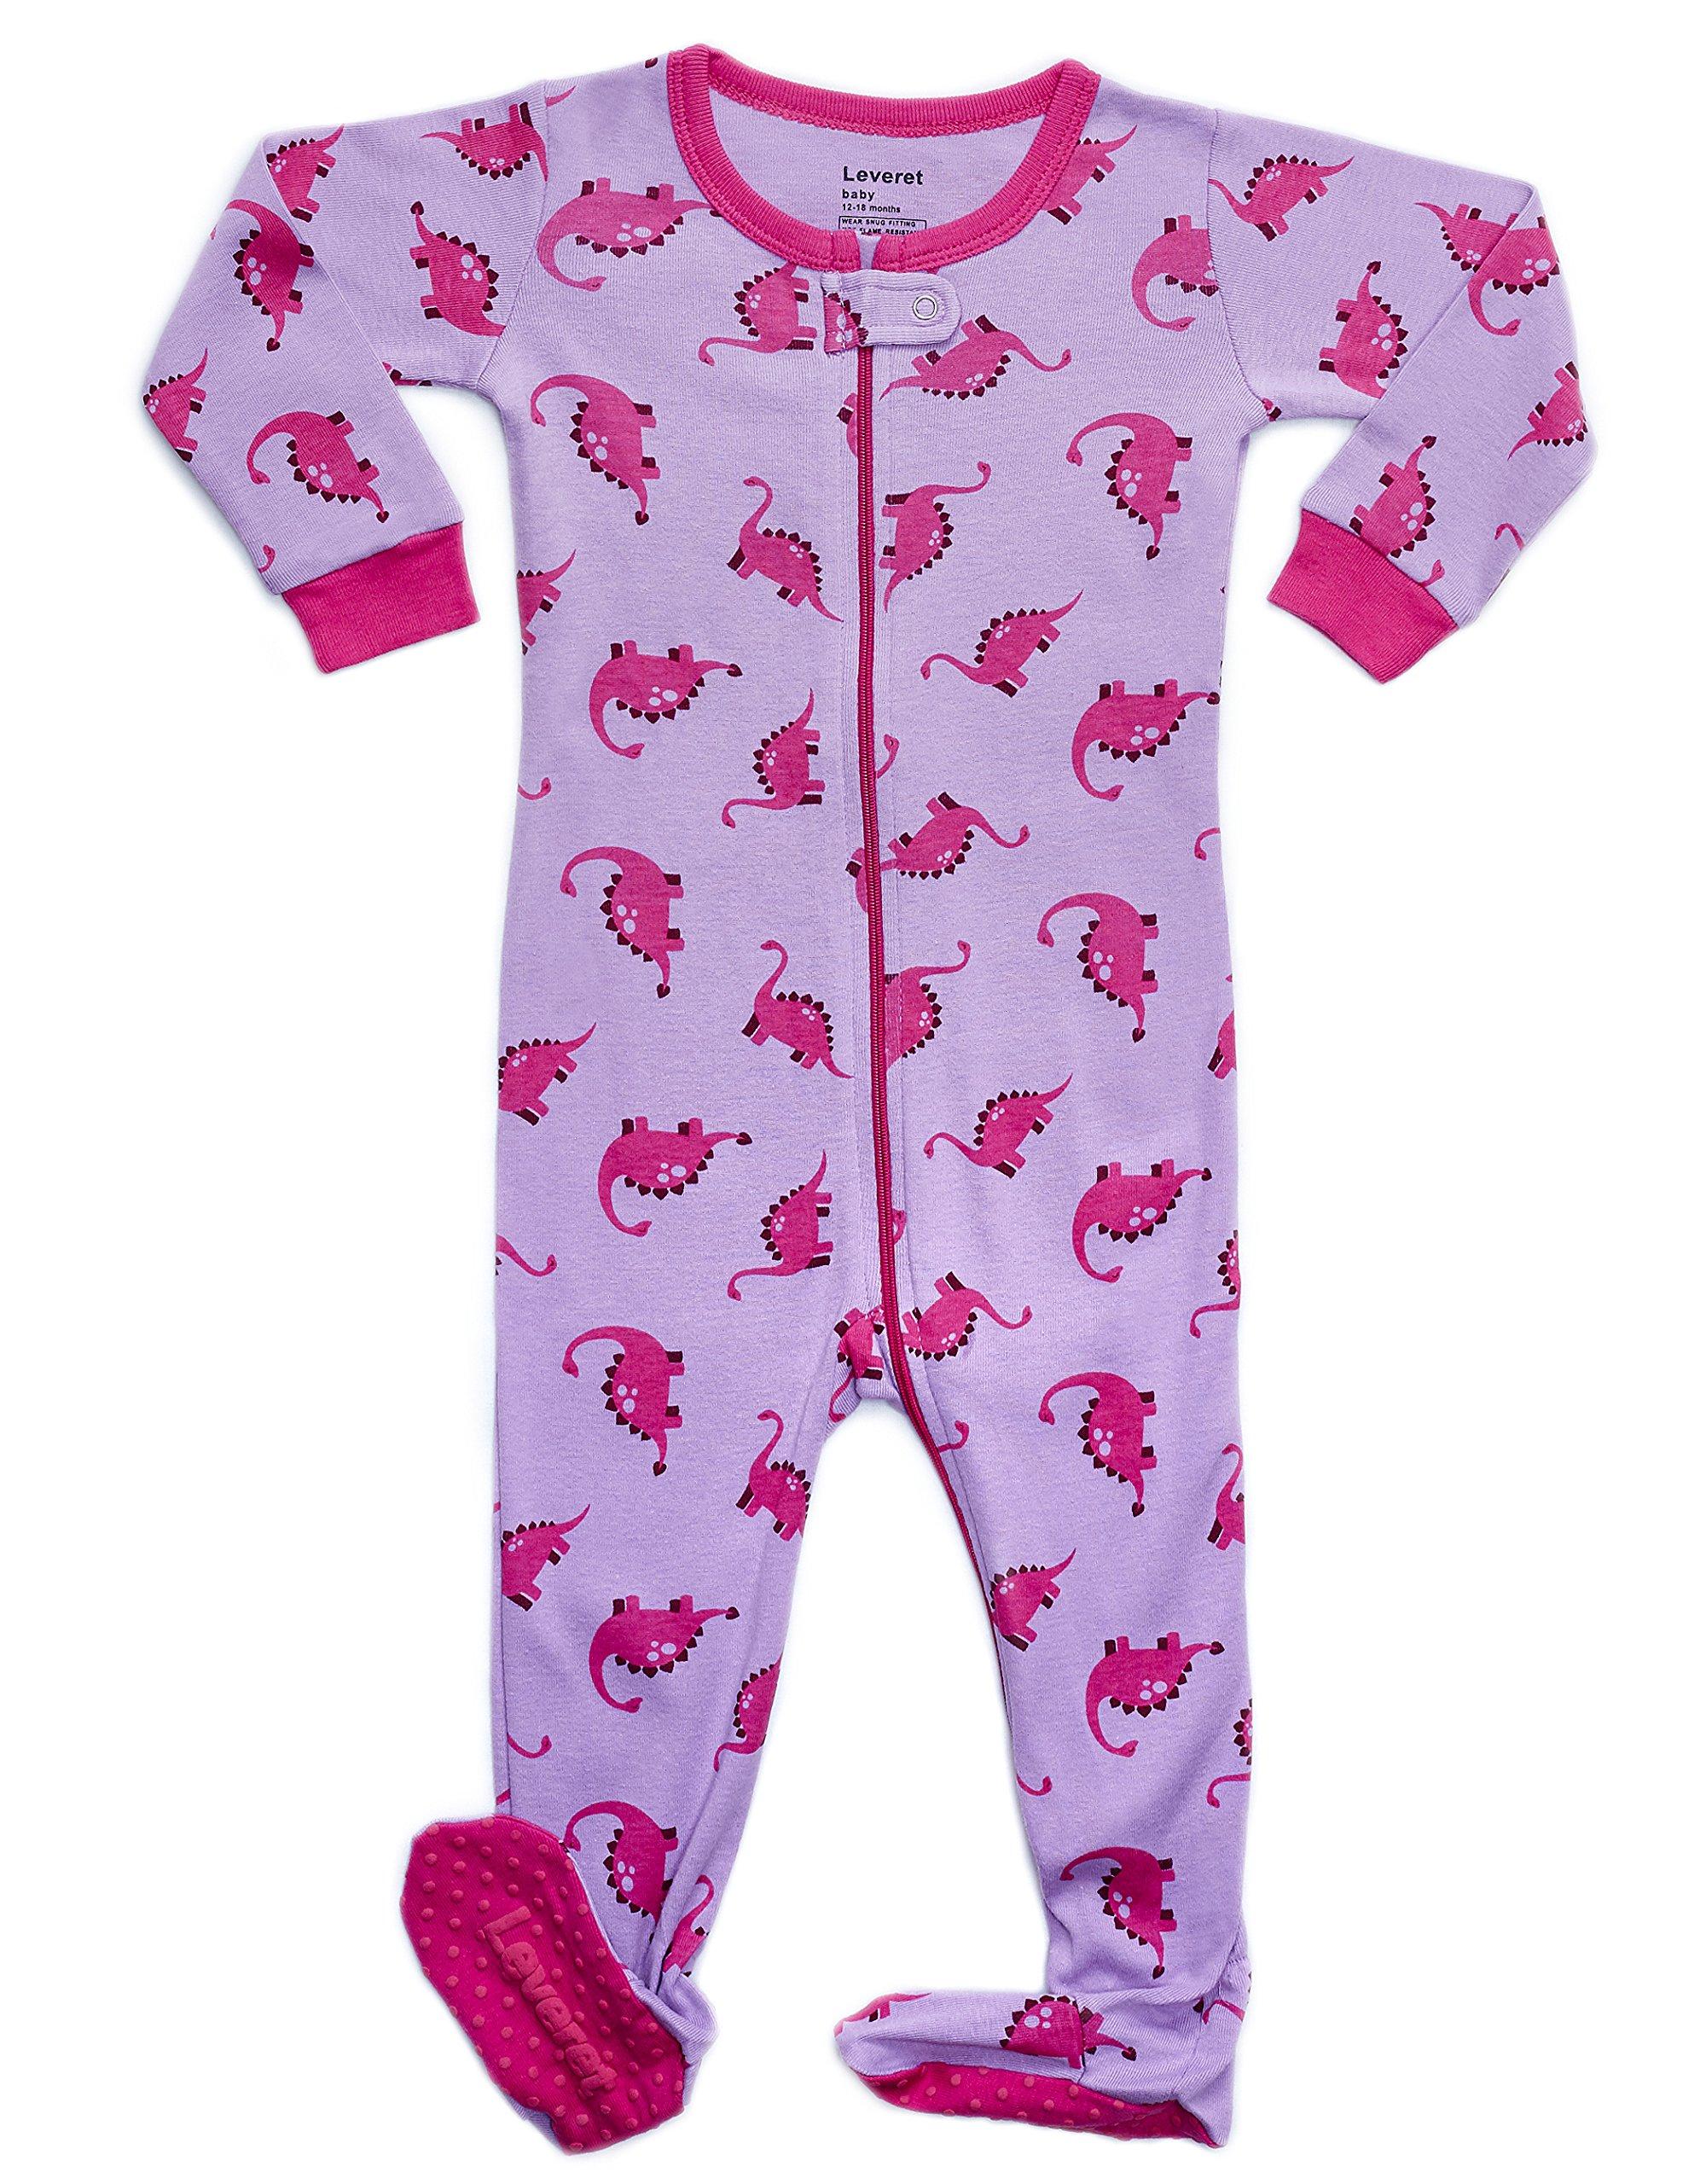 Leveret Dinosaur Footed Pajama Sleeper 100% Cotton